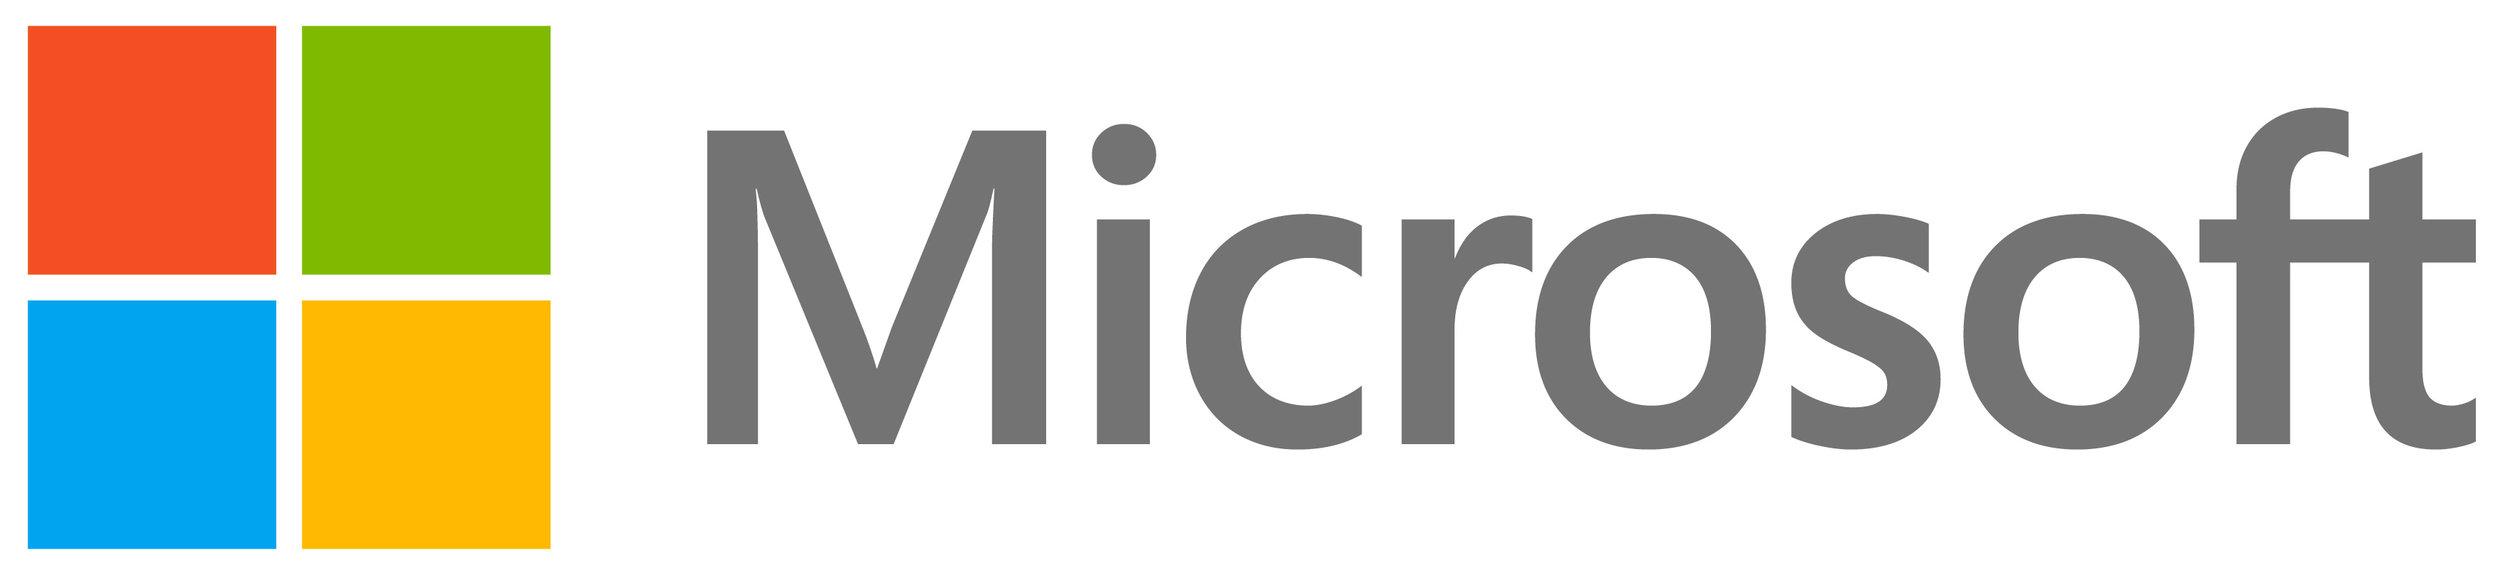 new-microsoft-logo-square-large.jpg